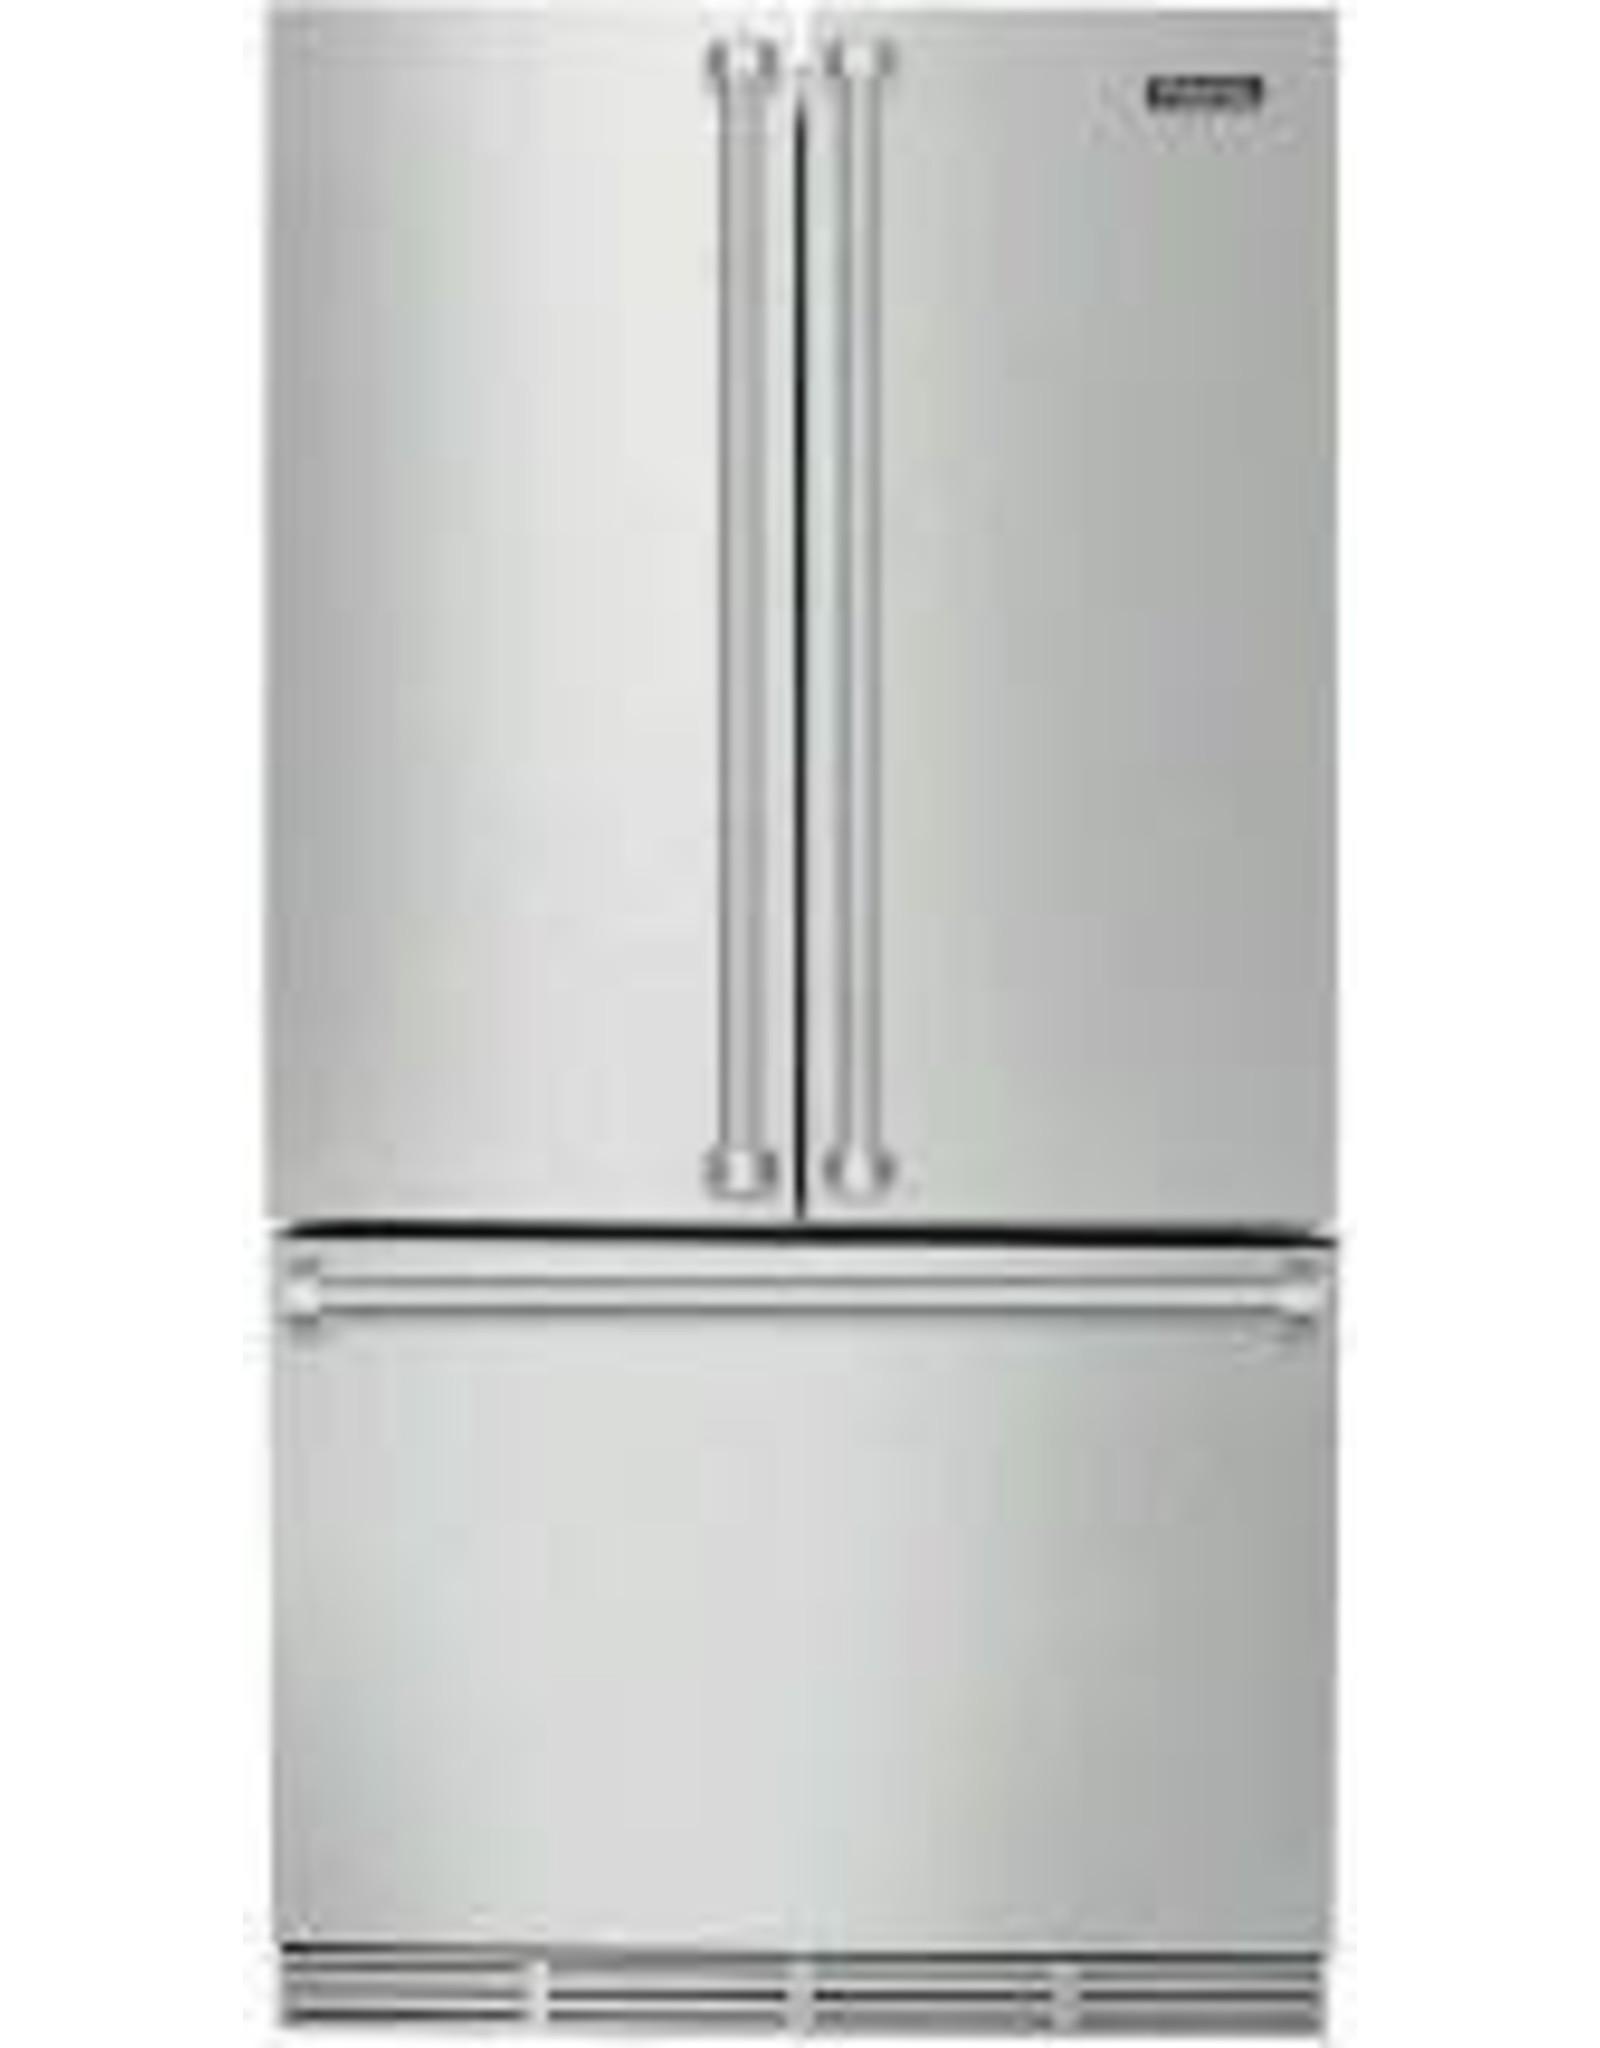 viking RVRF3361SS Viking - 3 Series 22.1 Cu. Ft. French Door Counter-Depth Refrigerator - Stainless steel